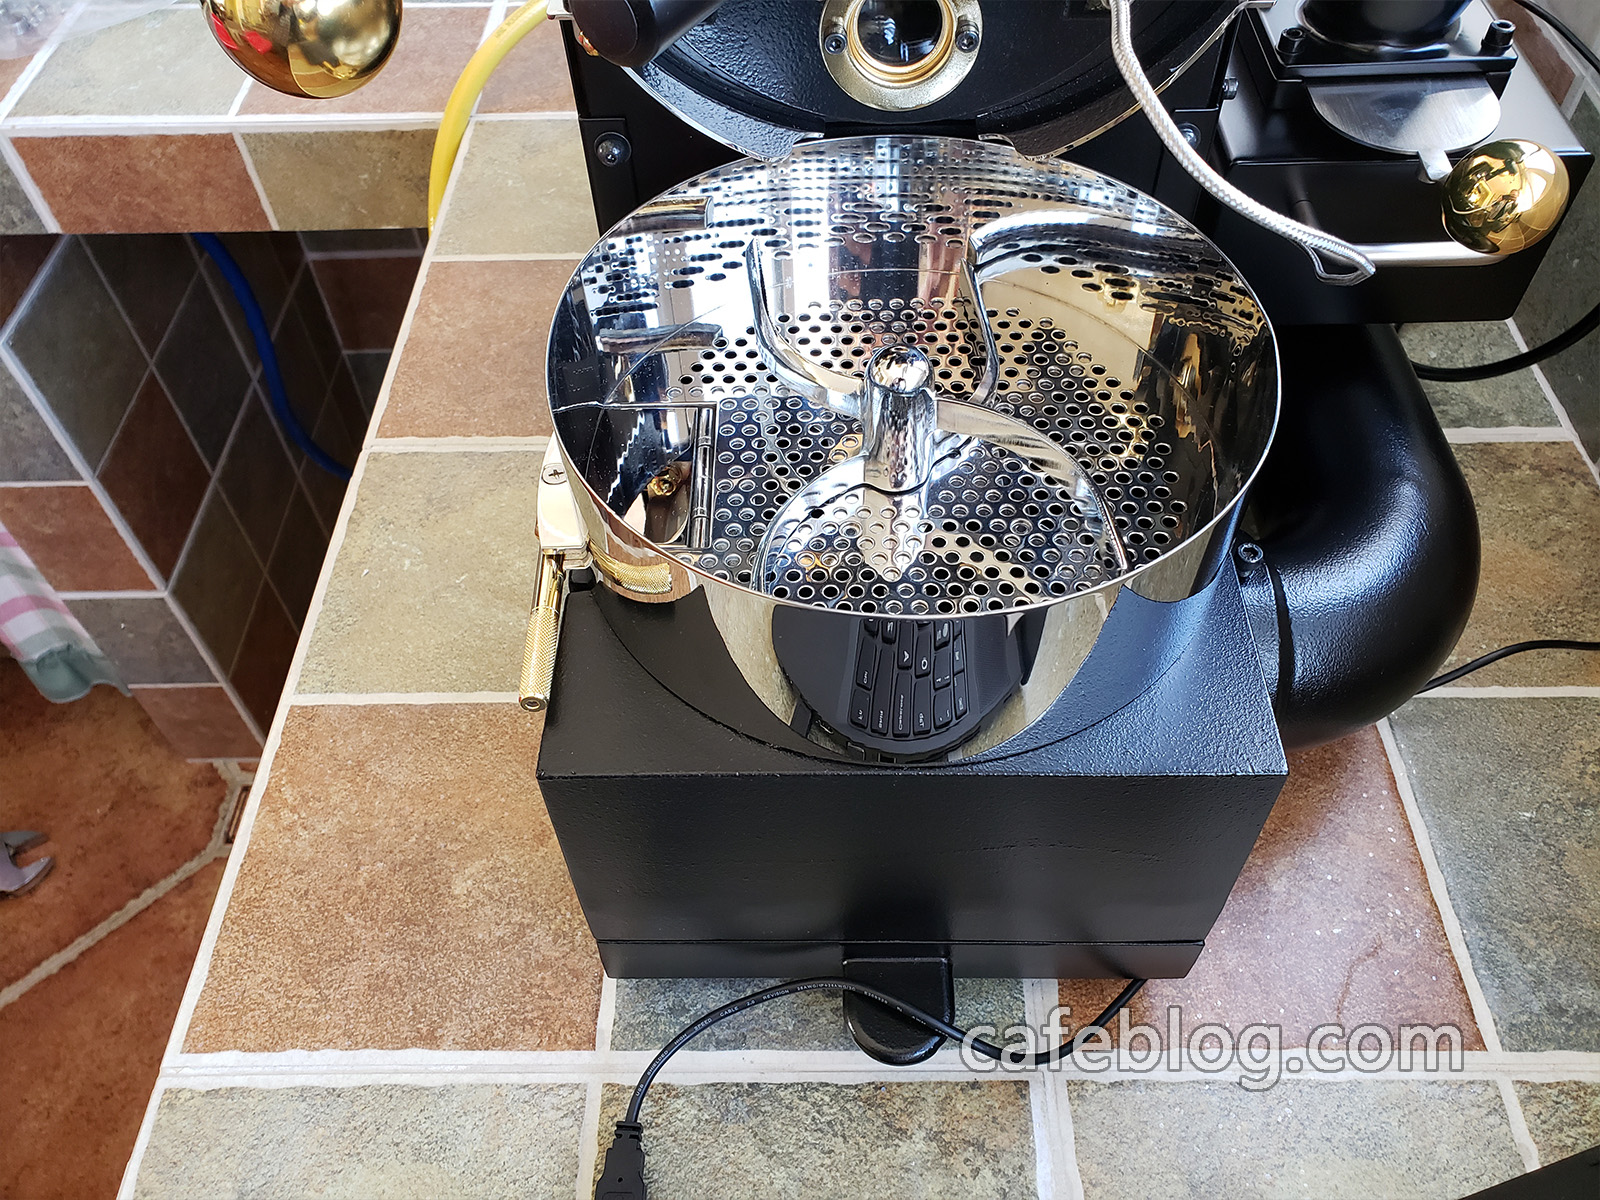 DISCOVERY咖啡烘焙机安装完毕。